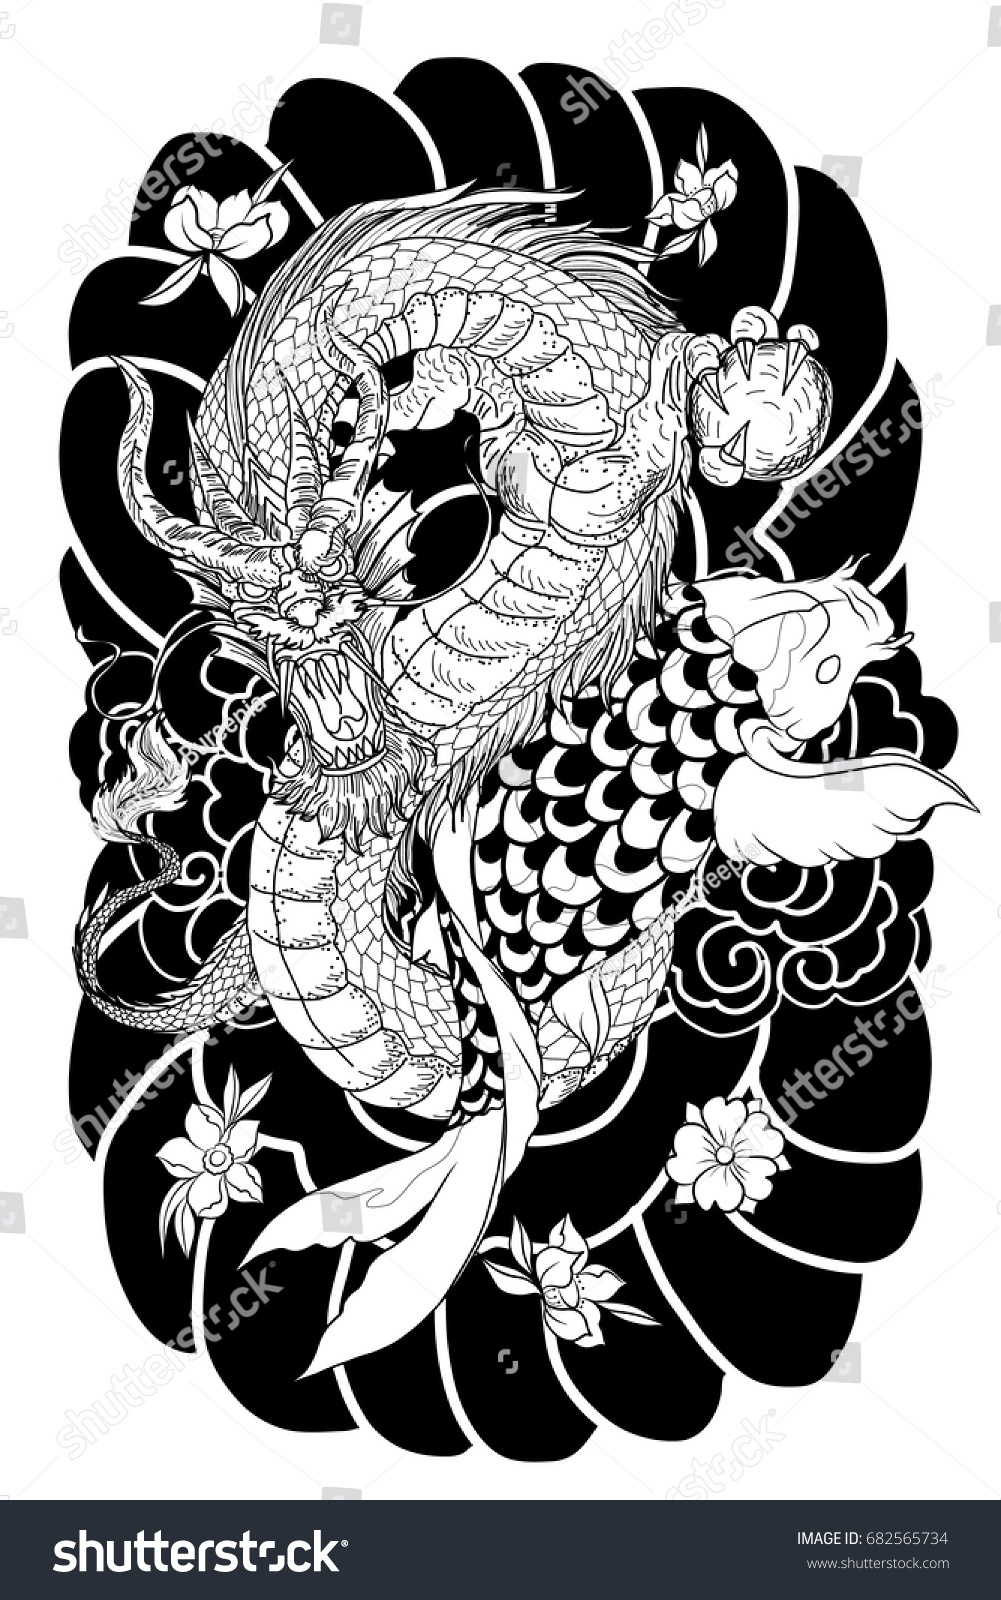 hand drawn dragon koi fish flower stock vector 682565734 shutterstock. Black Bedroom Furniture Sets. Home Design Ideas